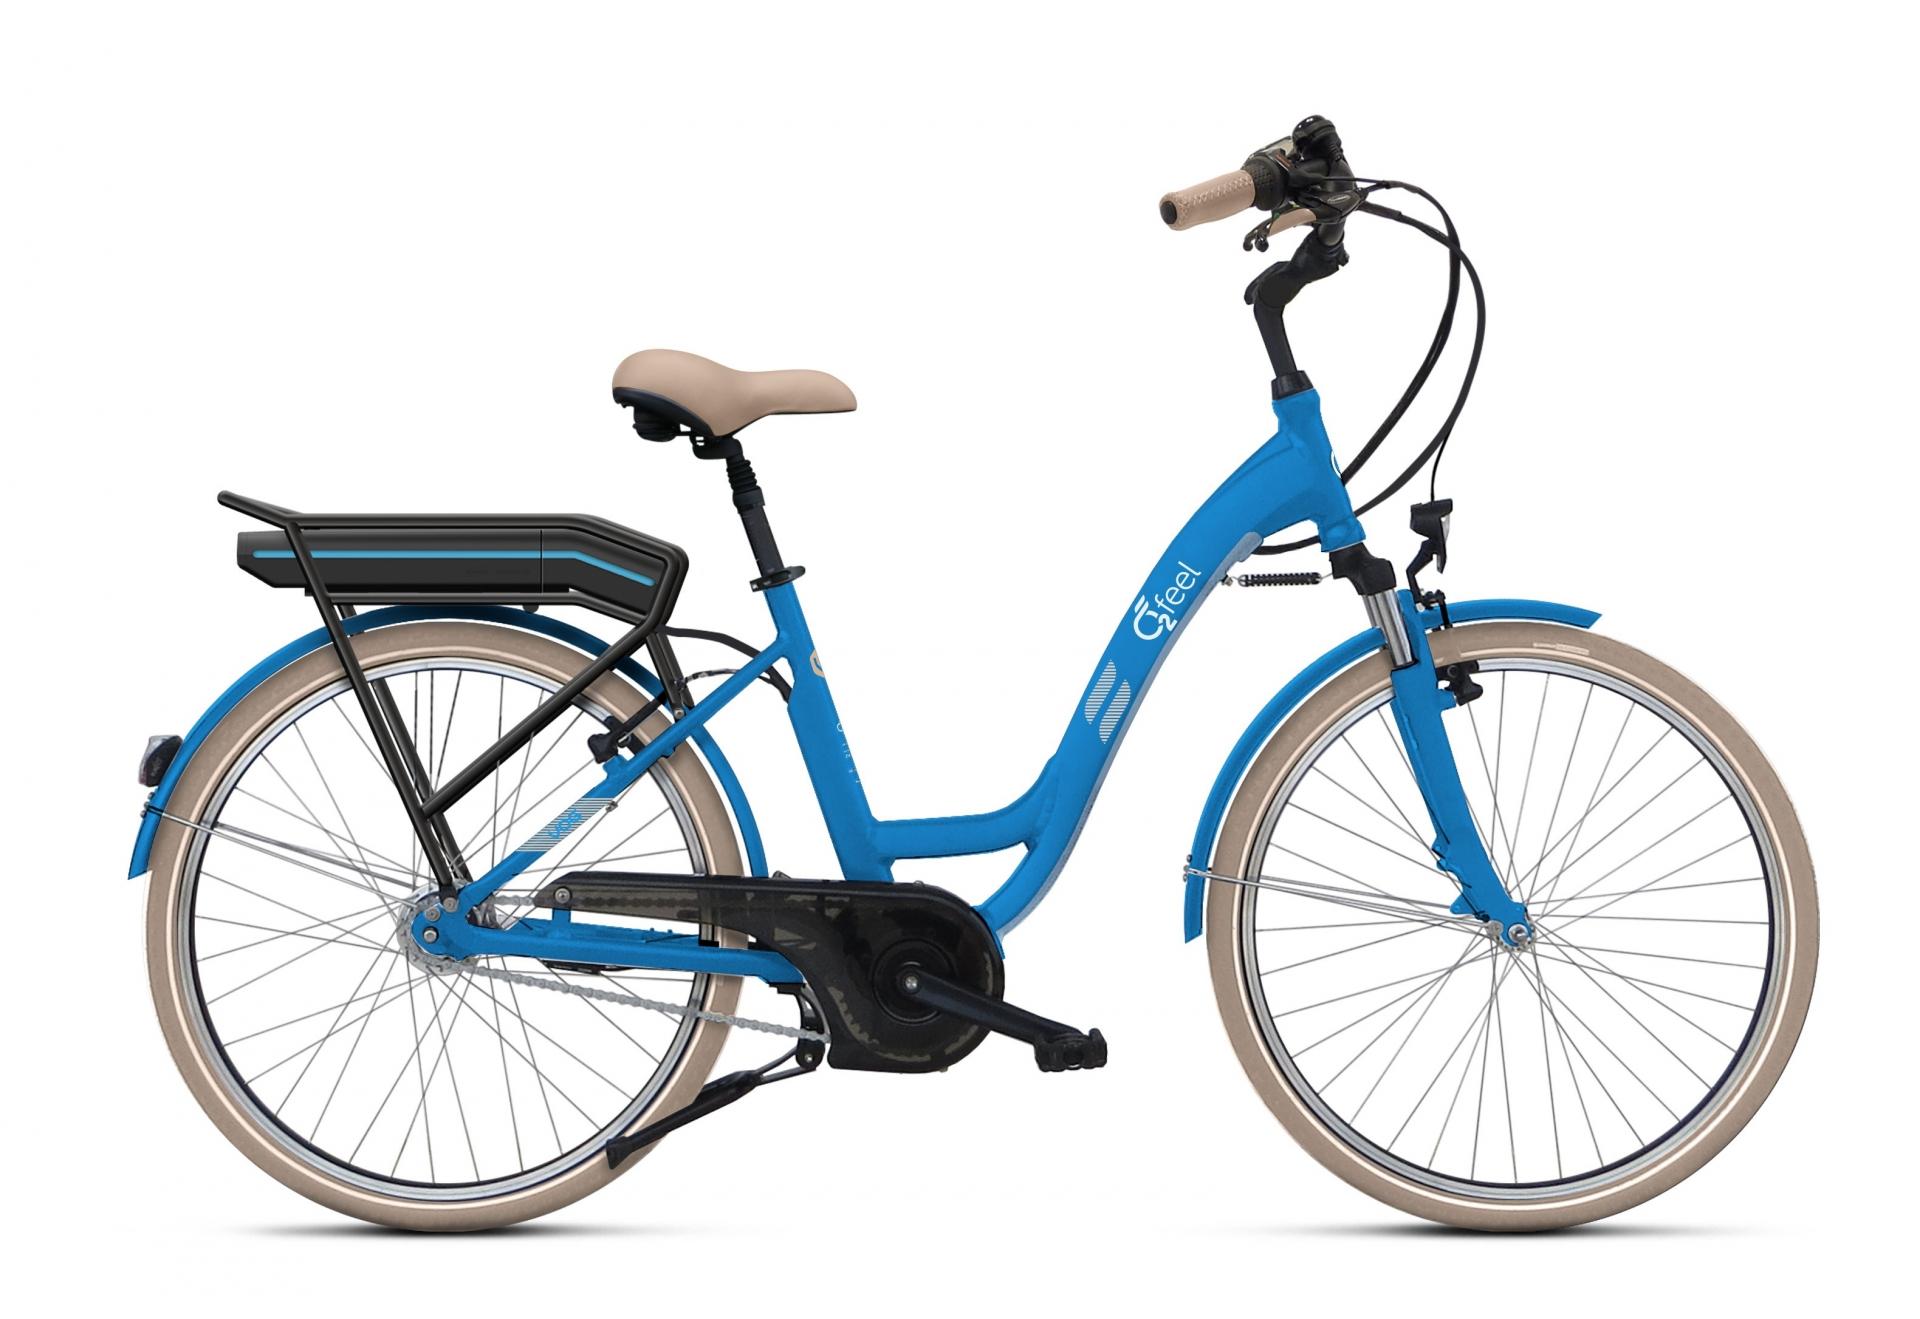 Vélo électrique O2Feel Vog N7C 28 374 Wh Skyblue Limited